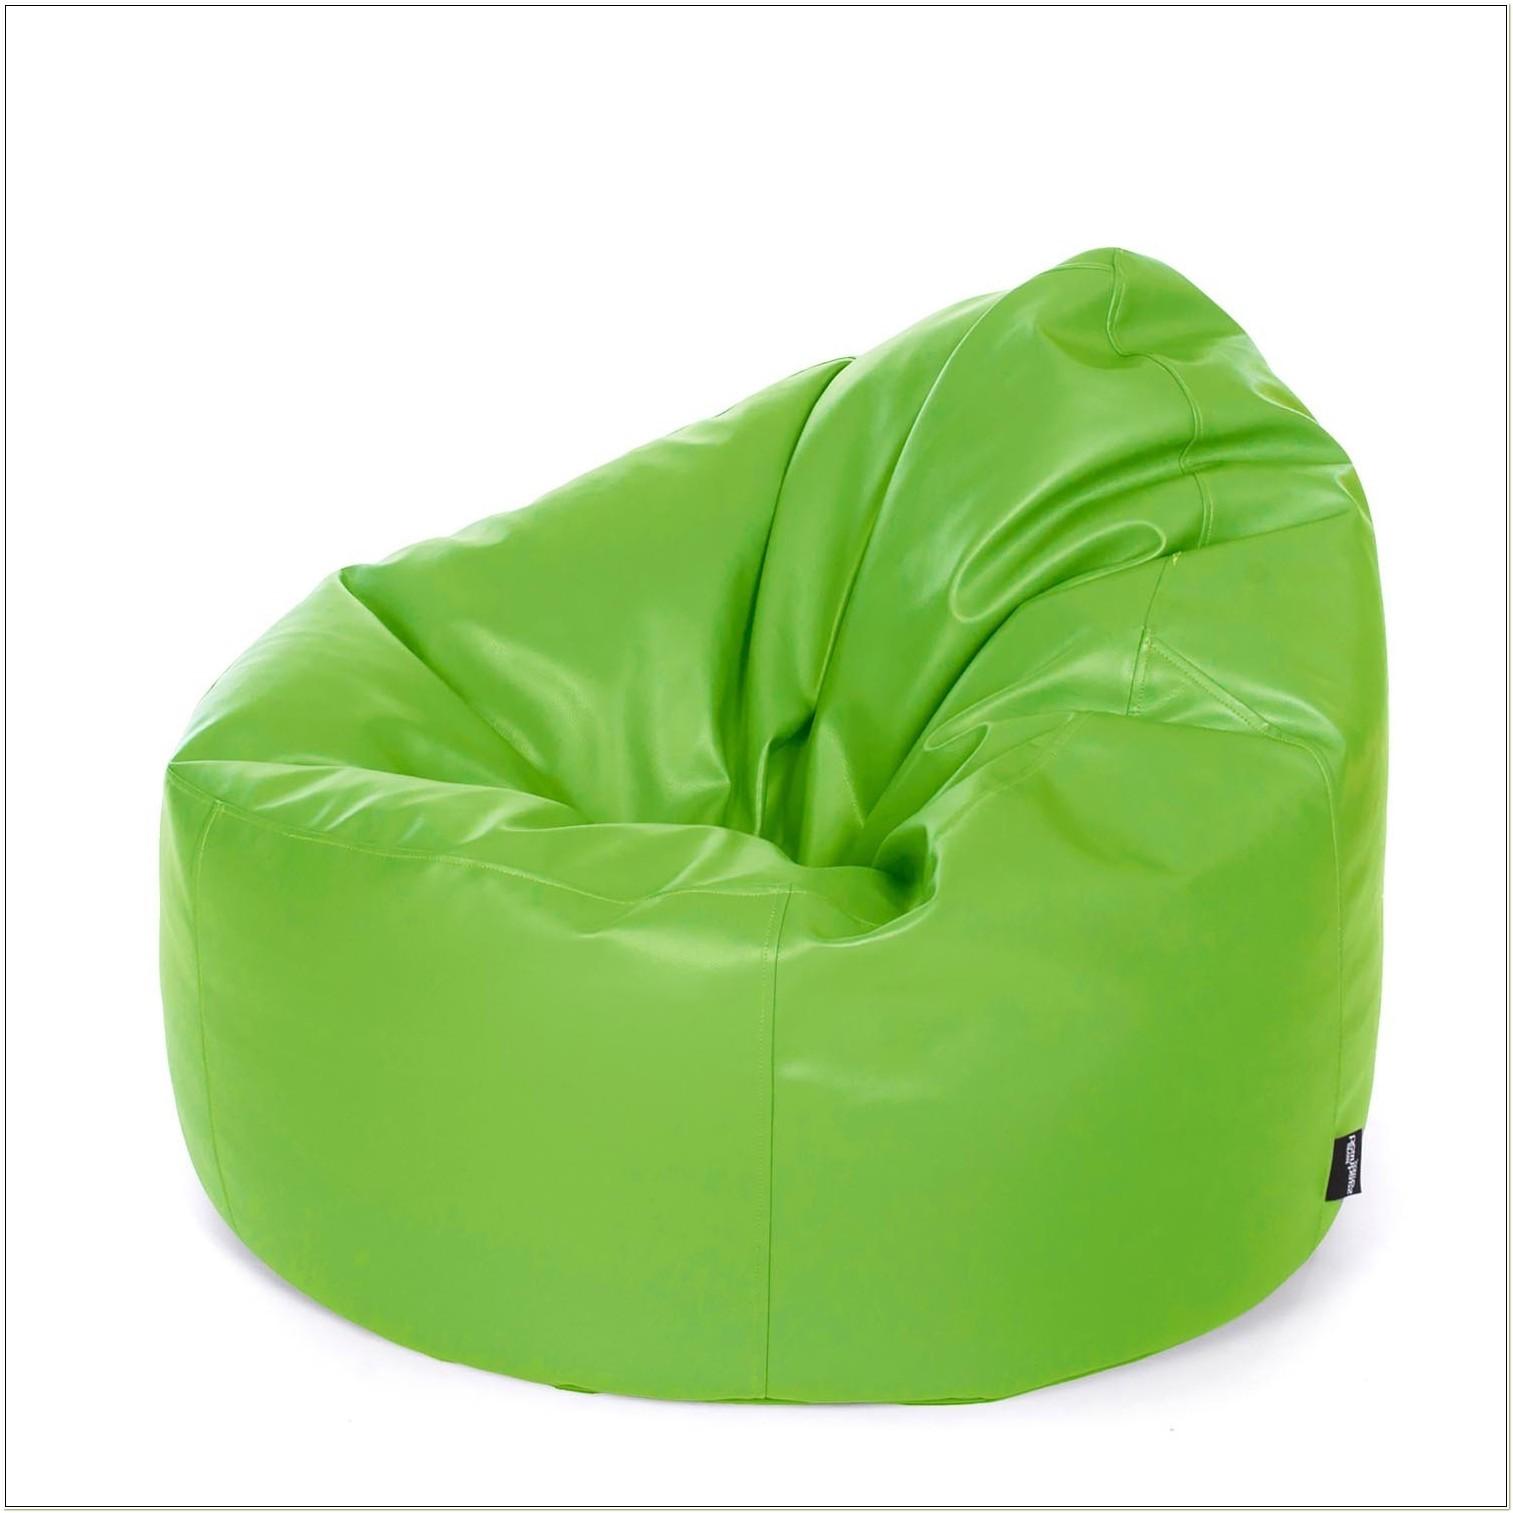 Lime Green Beanbag Chair